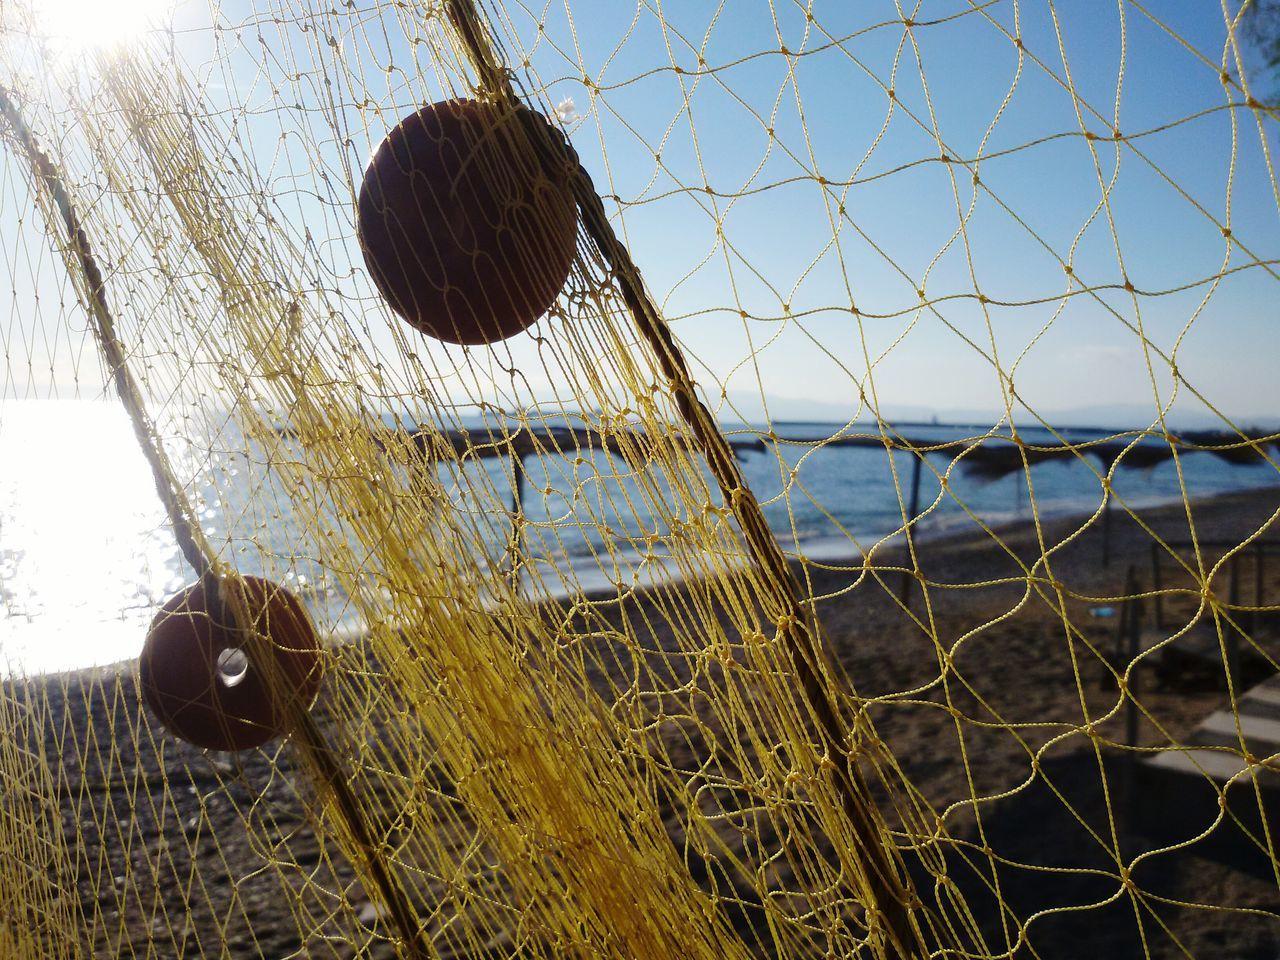 Sky Fishing Net Close-up Clear Sky Nature Outdoors Day Fishing Fishnet Sunlight Sun Beach Sea Fishnets Kalamata Greece